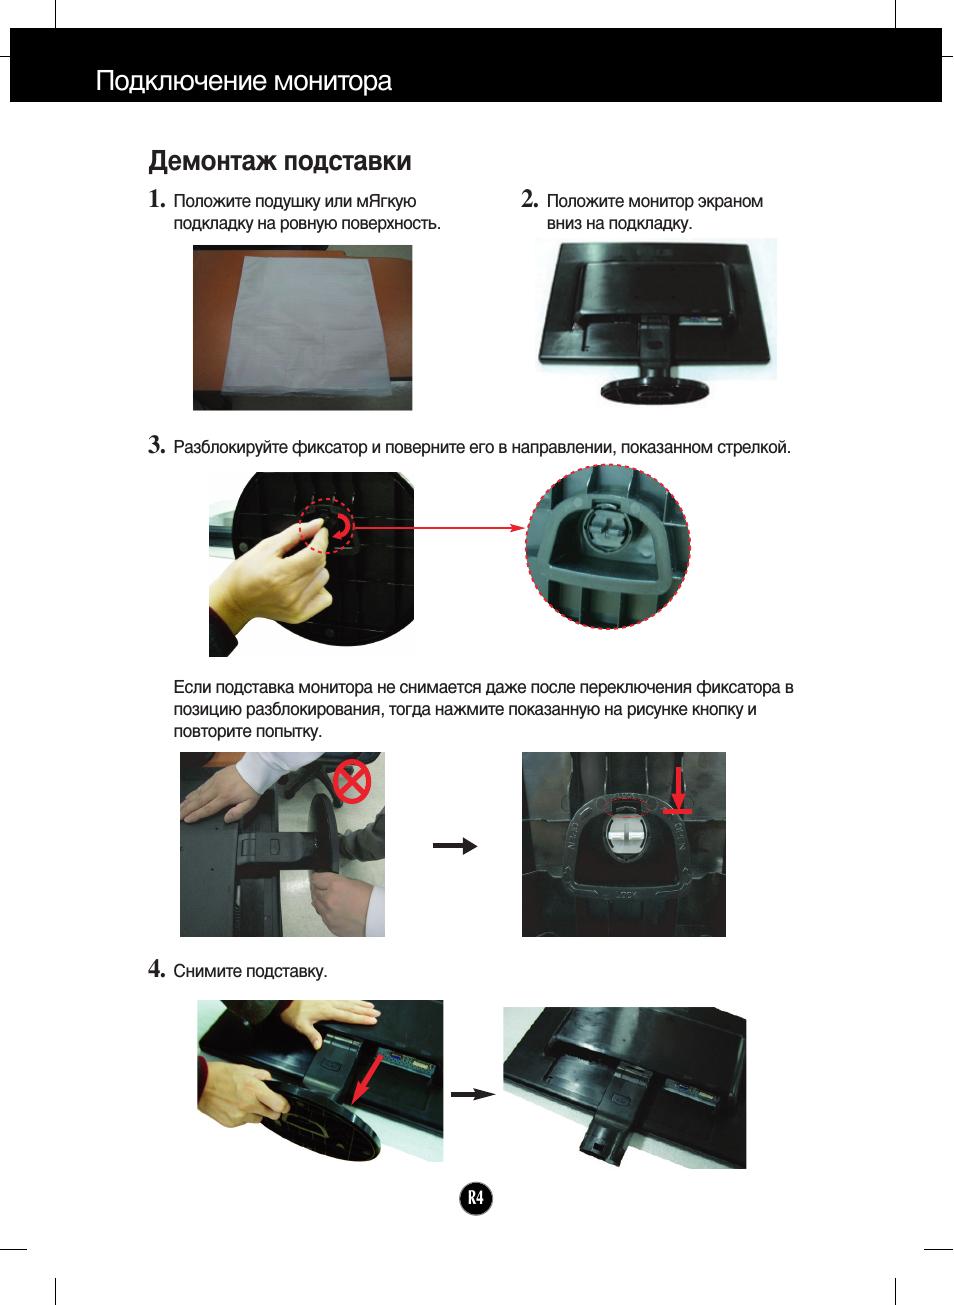 Демонтаж подставки, Подключение монитора